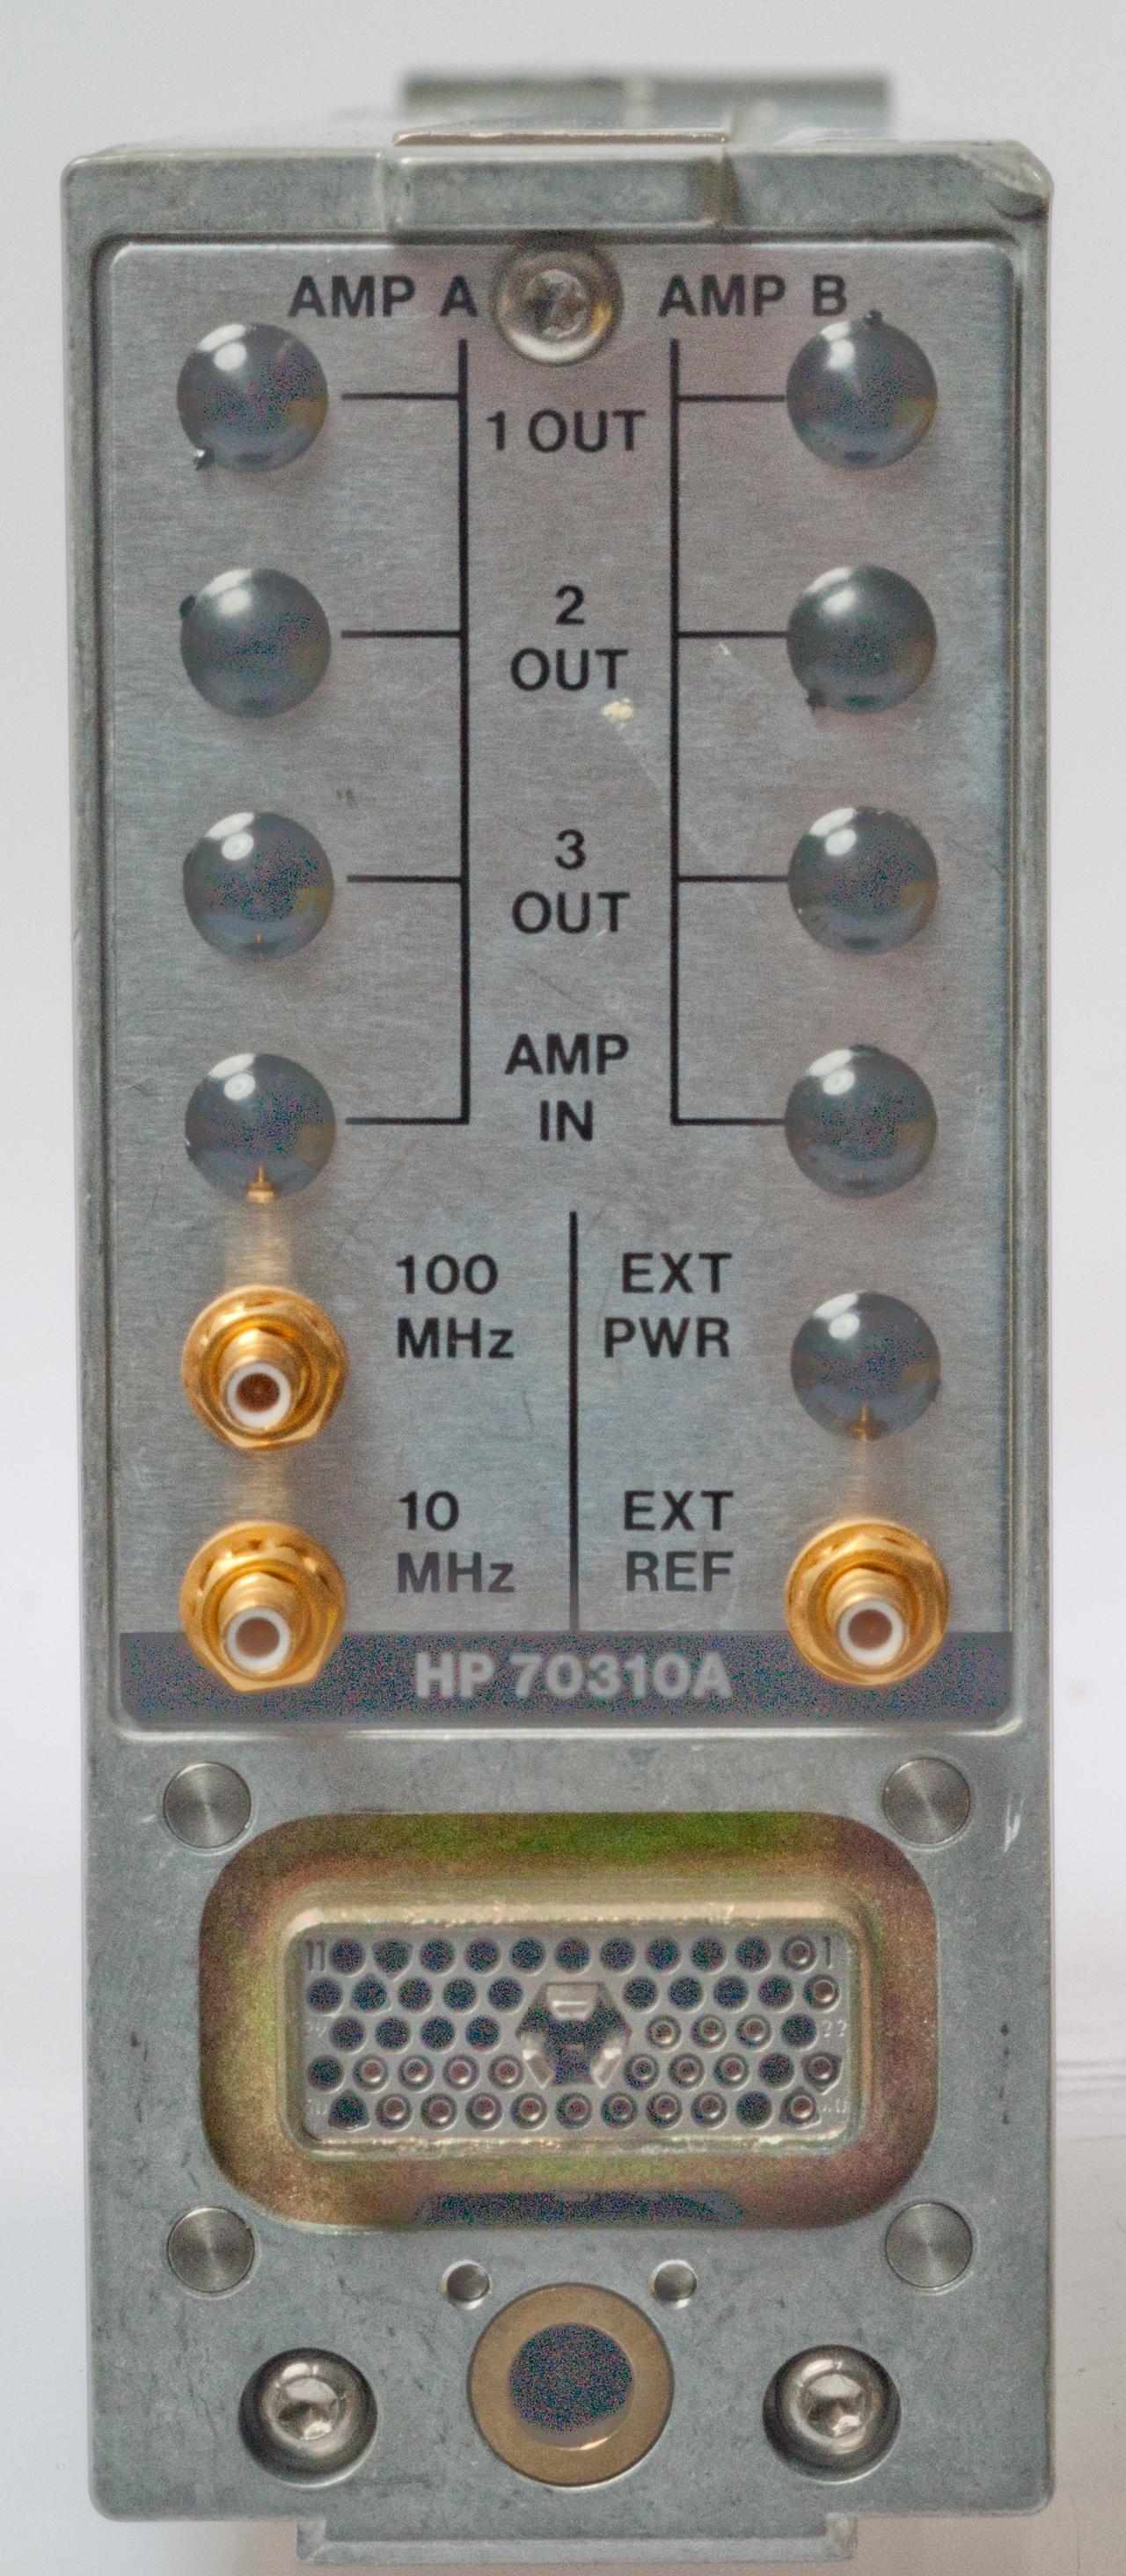 HP 71100C 2 9 GHz Spectrum Analyzer